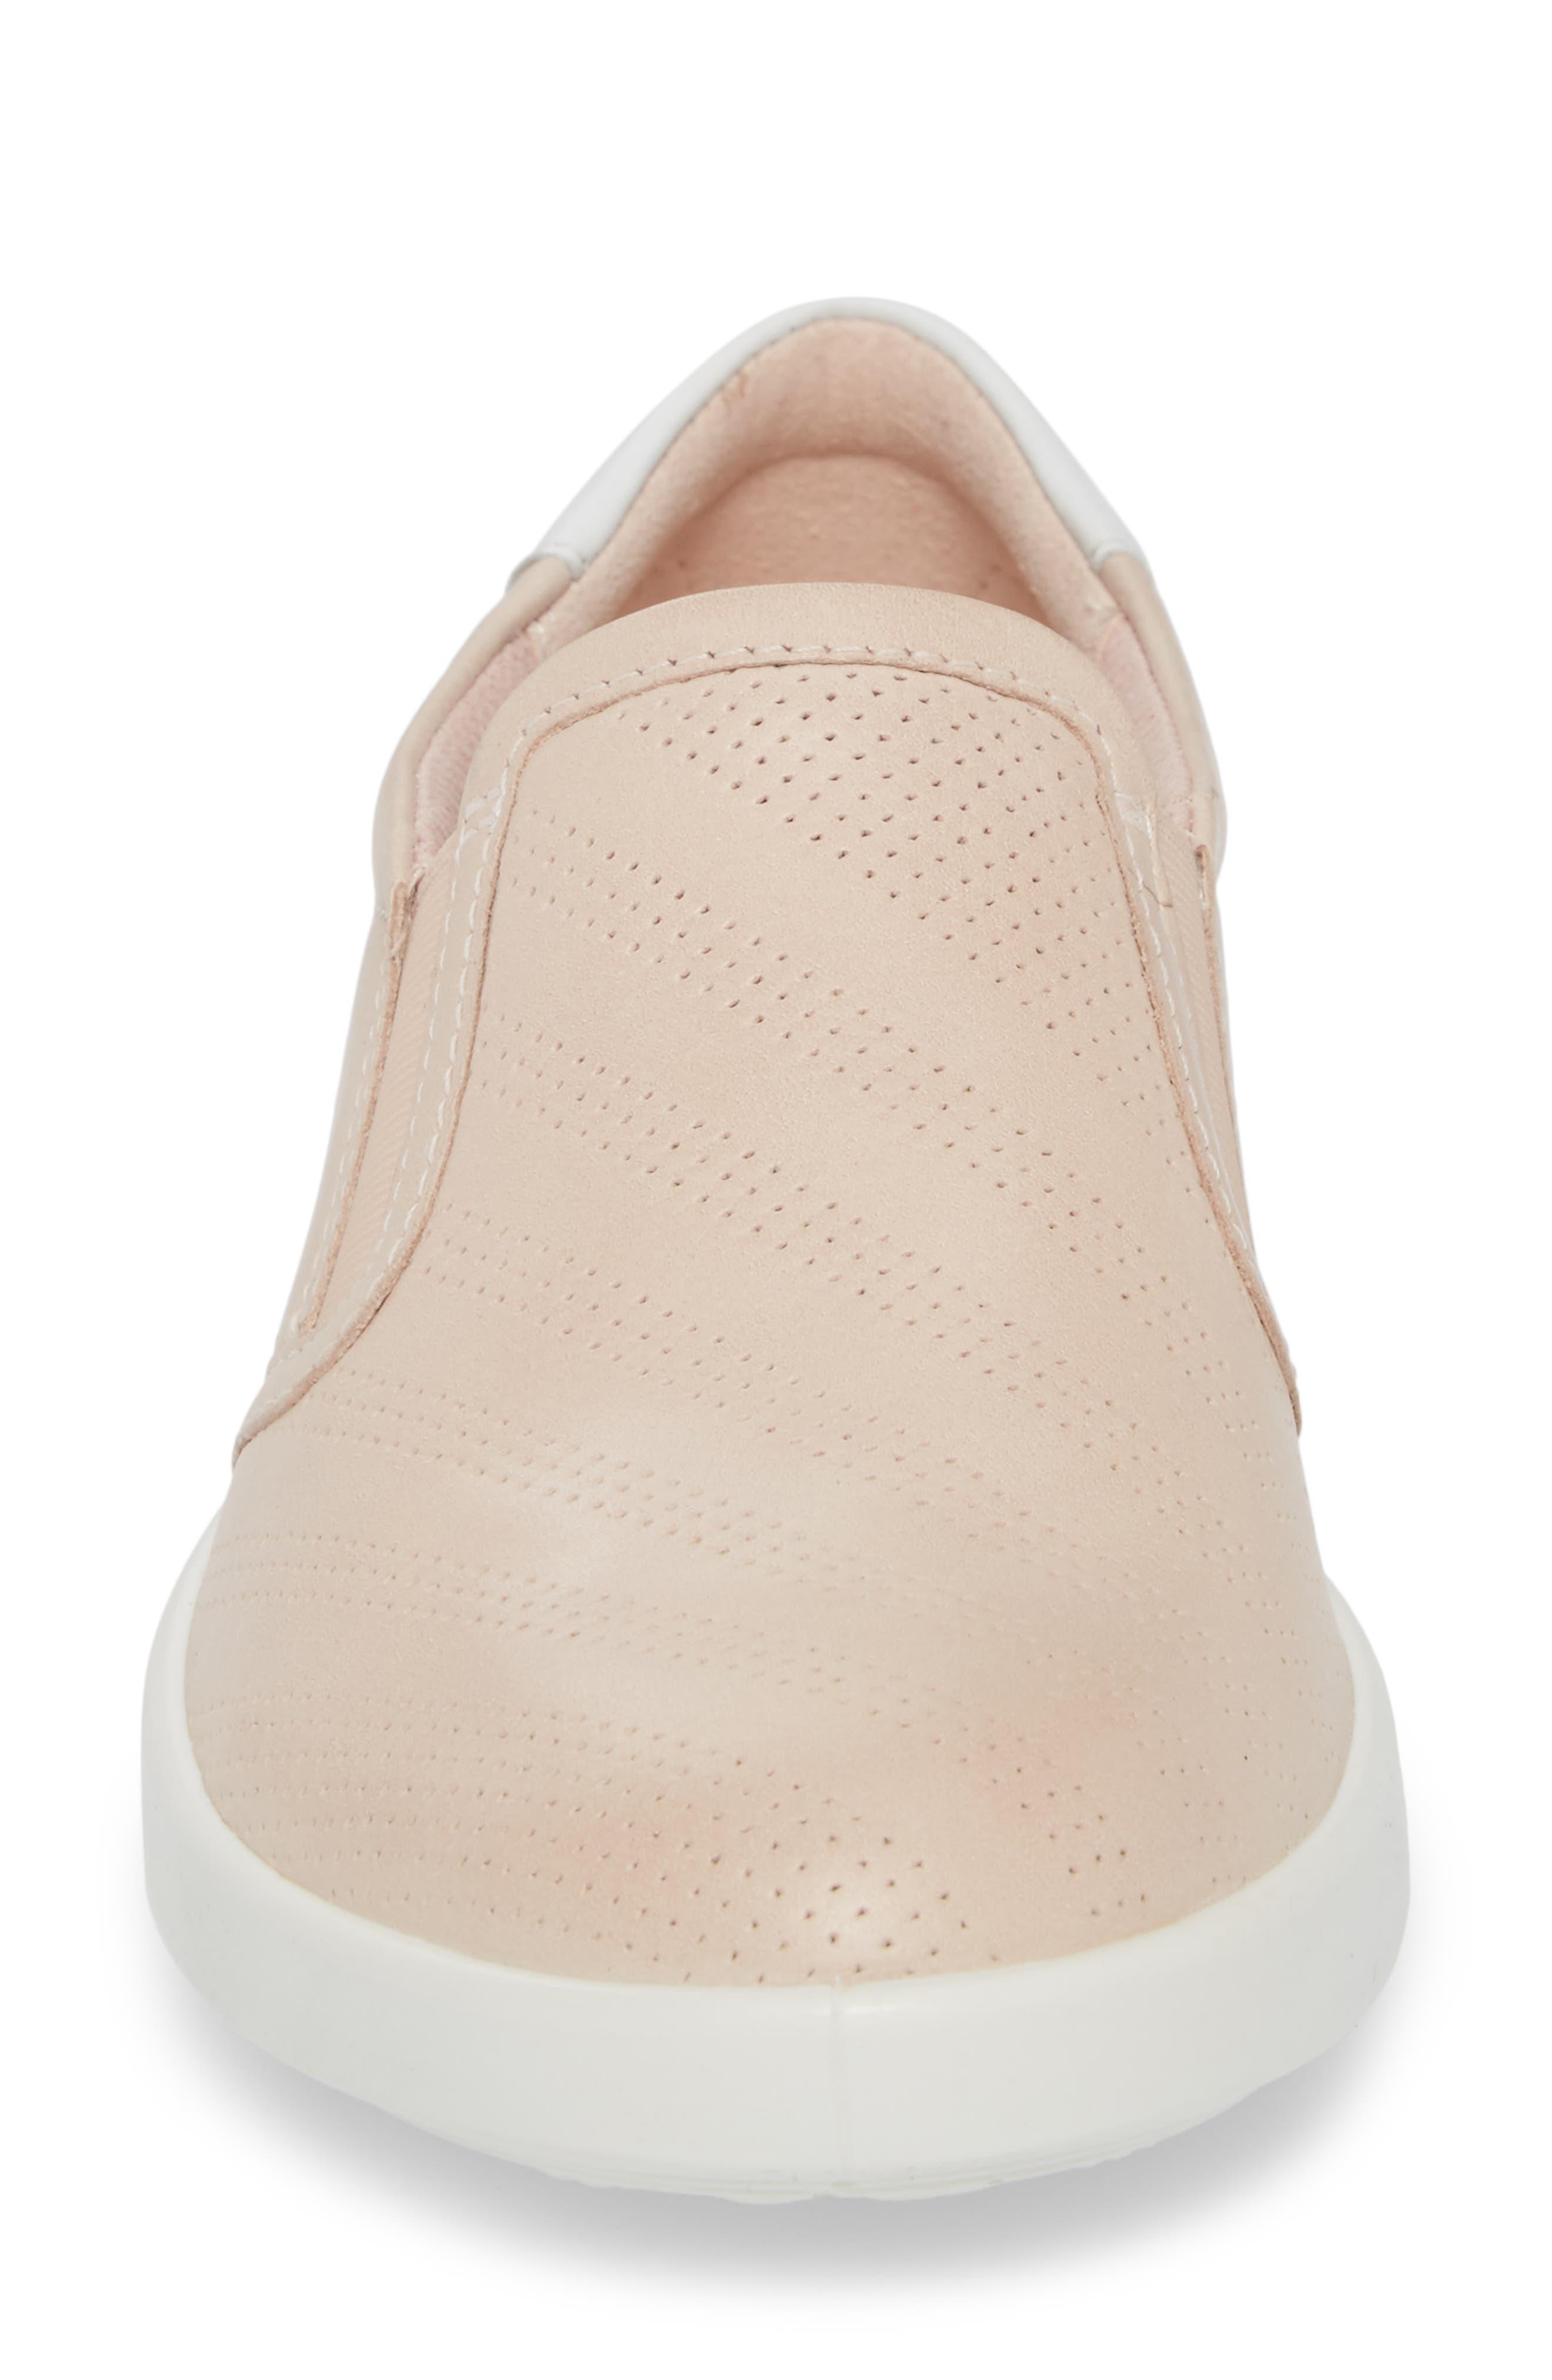 'Aimee' Slip-On Sneaker,                             Alternate thumbnail 4, color,                             Rose Dust Leather